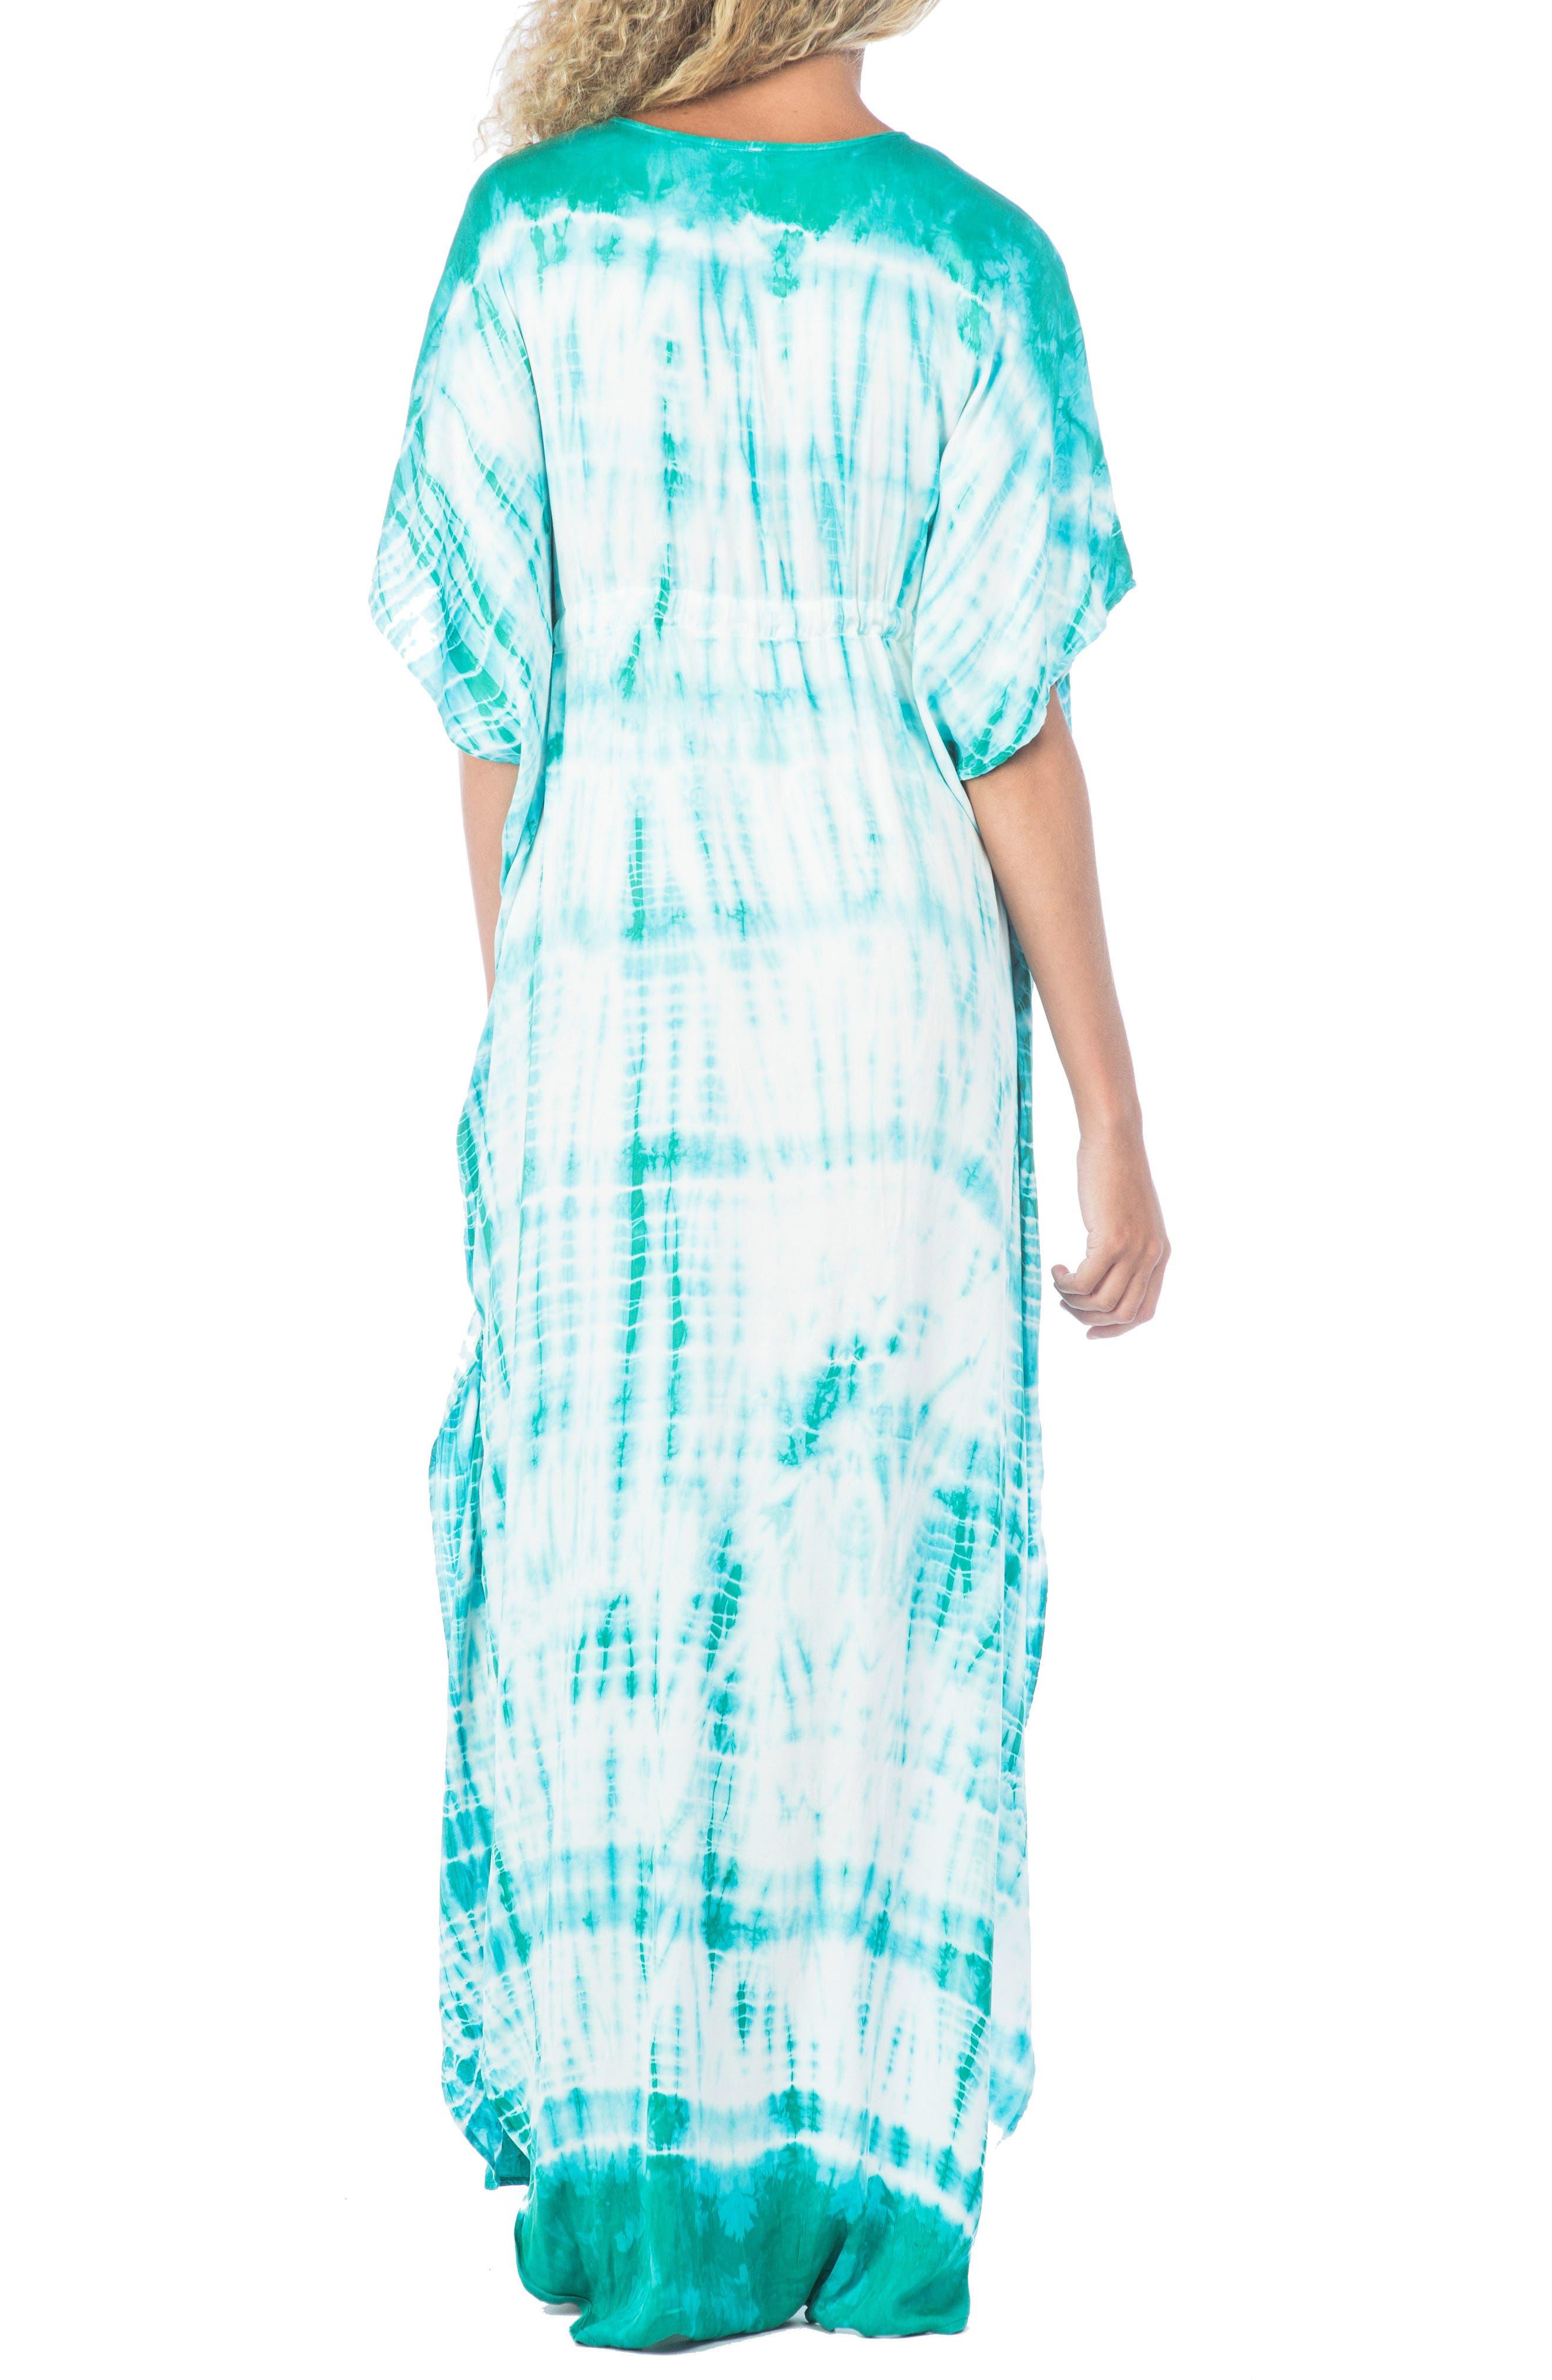 South Beach Tie Dye Ashley Cover-Up Dress,                             Alternate thumbnail 3, color,